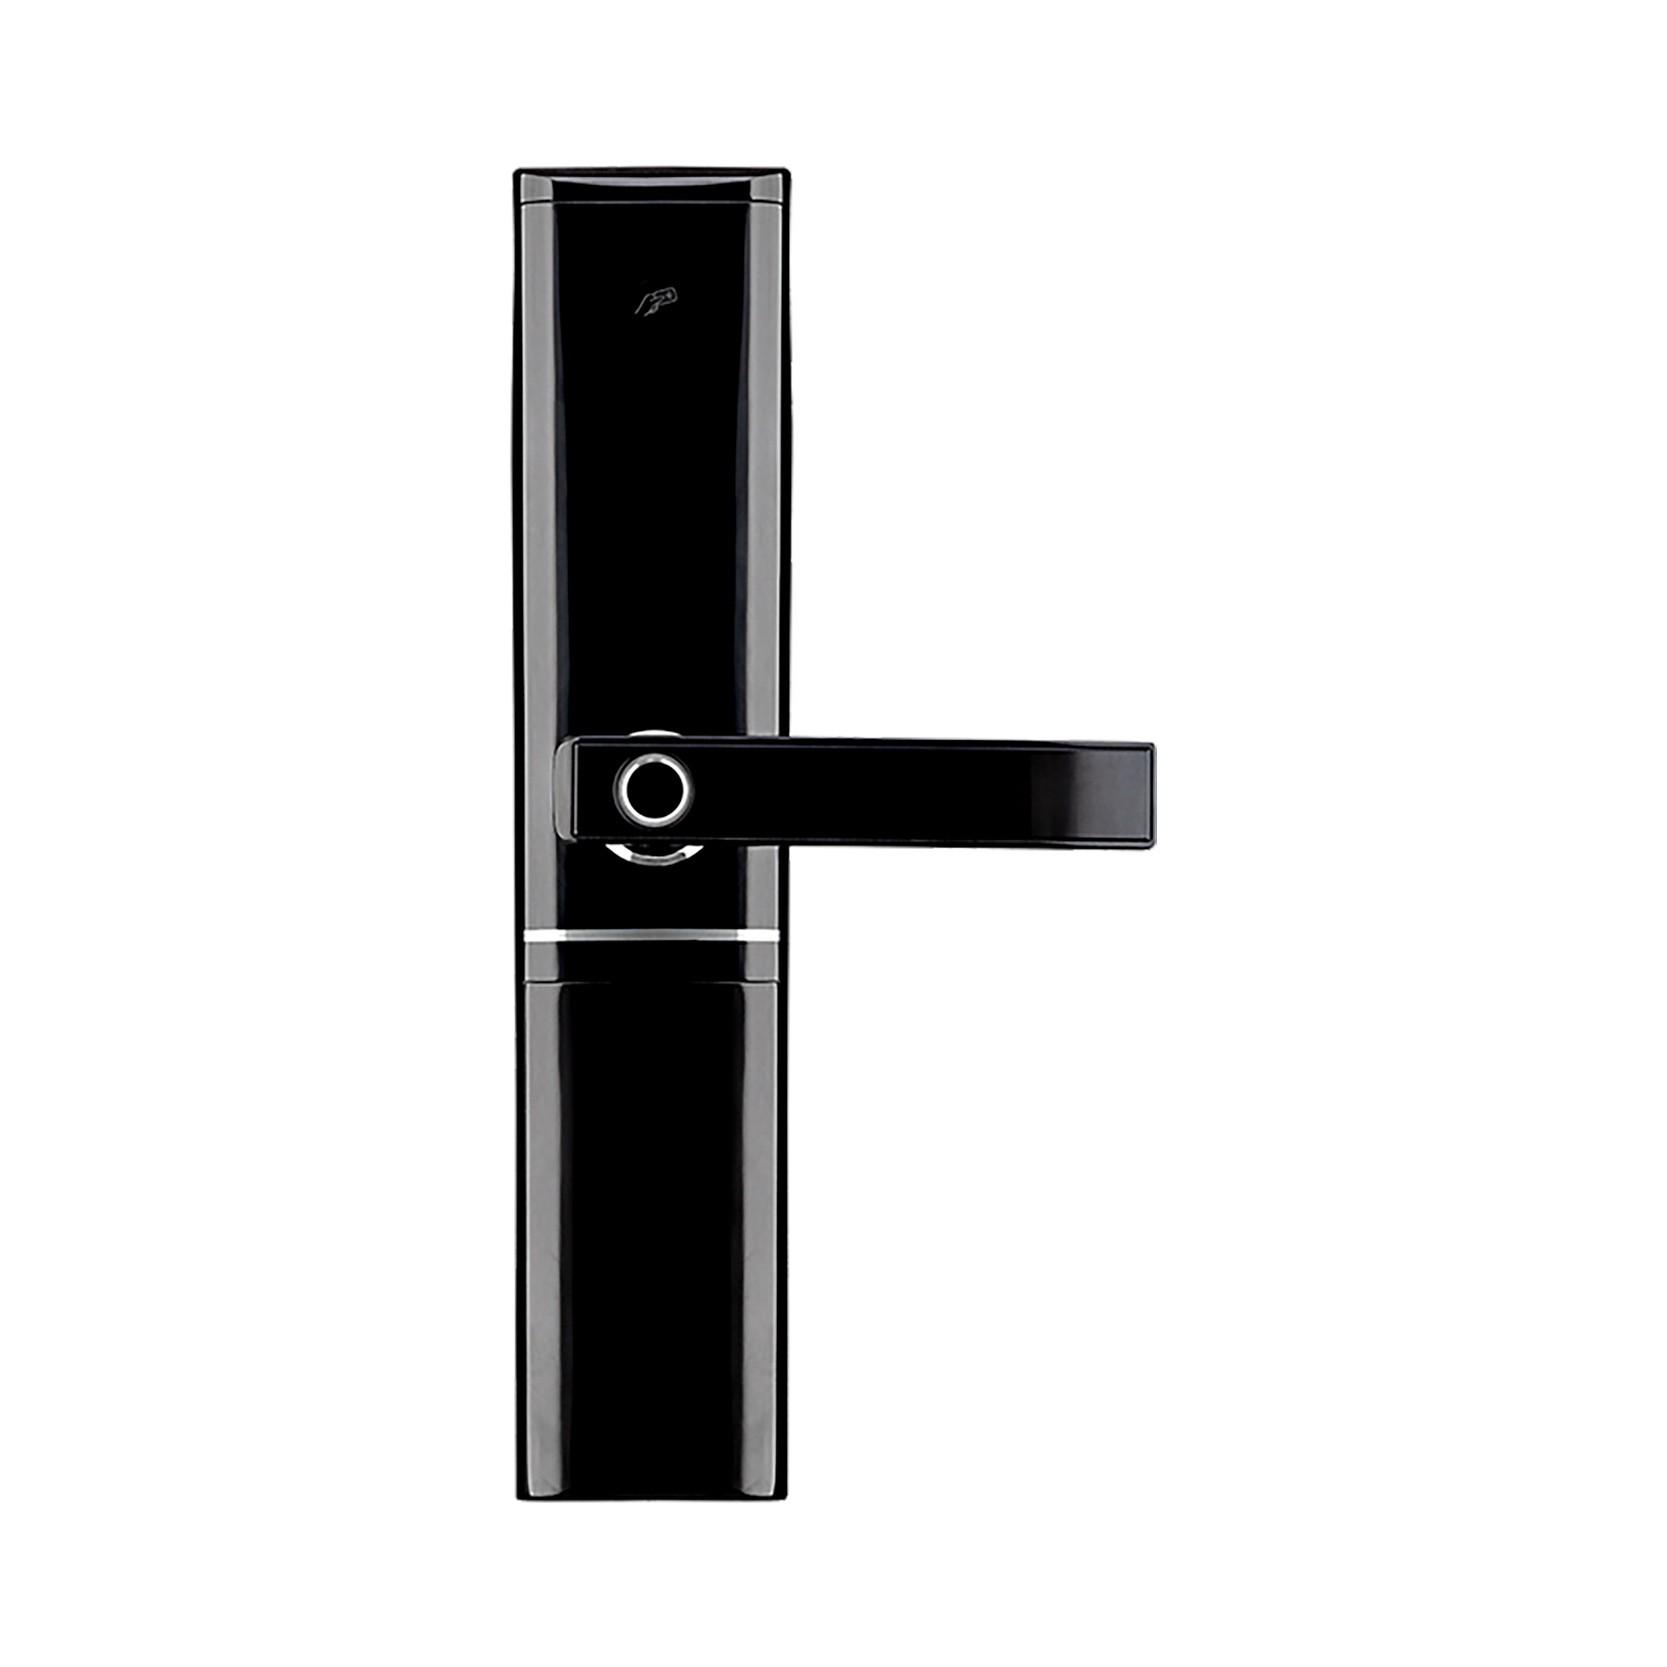 Fechadura Digital de Embutir FD-500 PRO